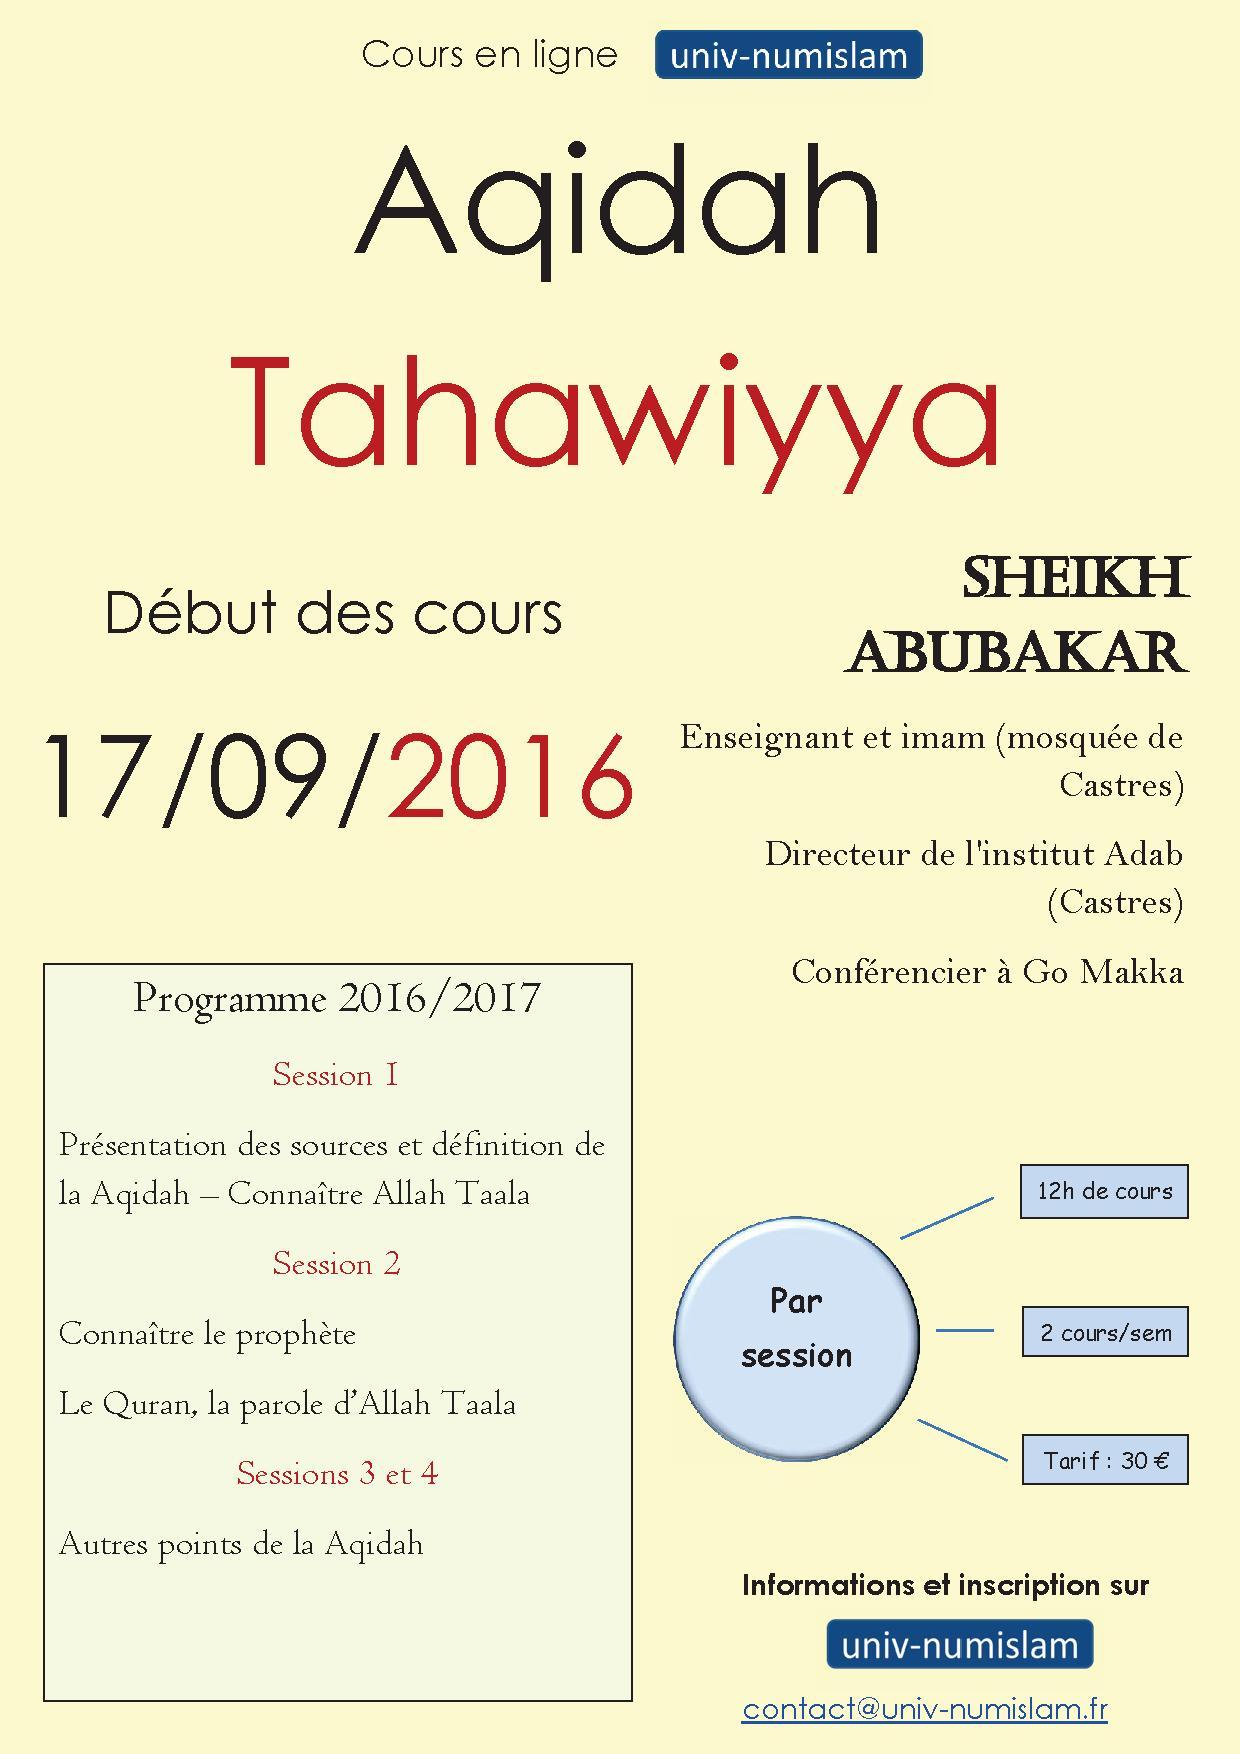 http://www.saphirnews.com/agenda/Aqidah-Tahawiyya-Cours-en-ligne-Module-1-sept-nov-2016_ae408887.html